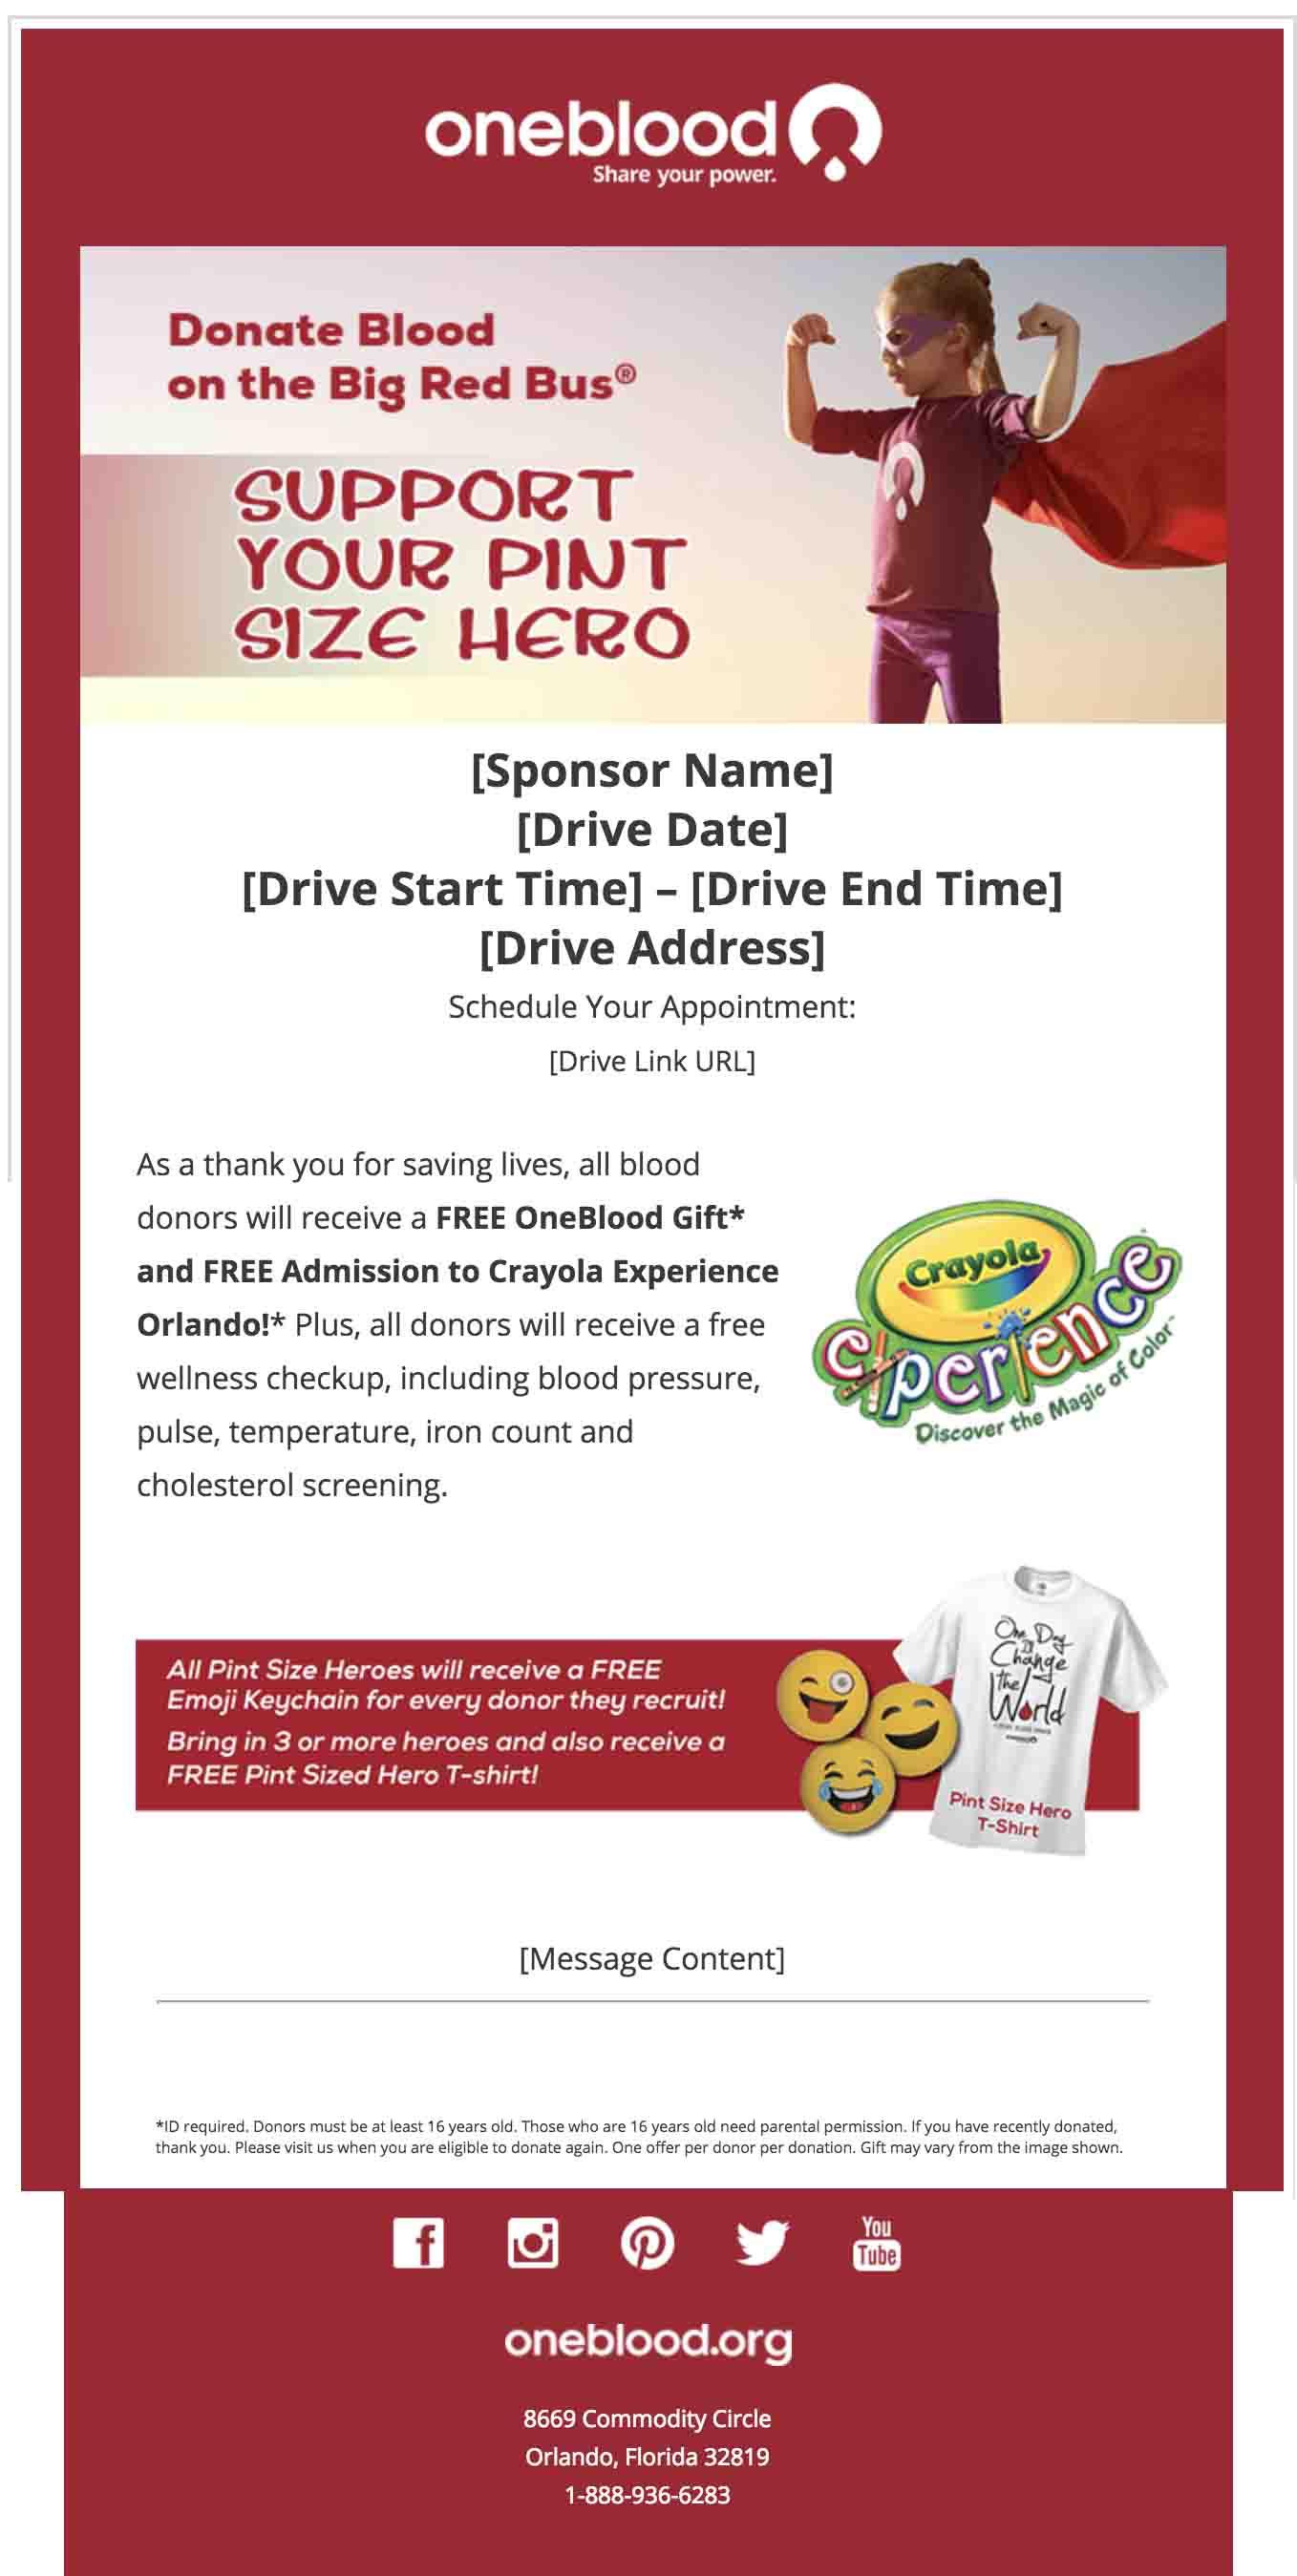 Pint Size Hero Program | OneBlood